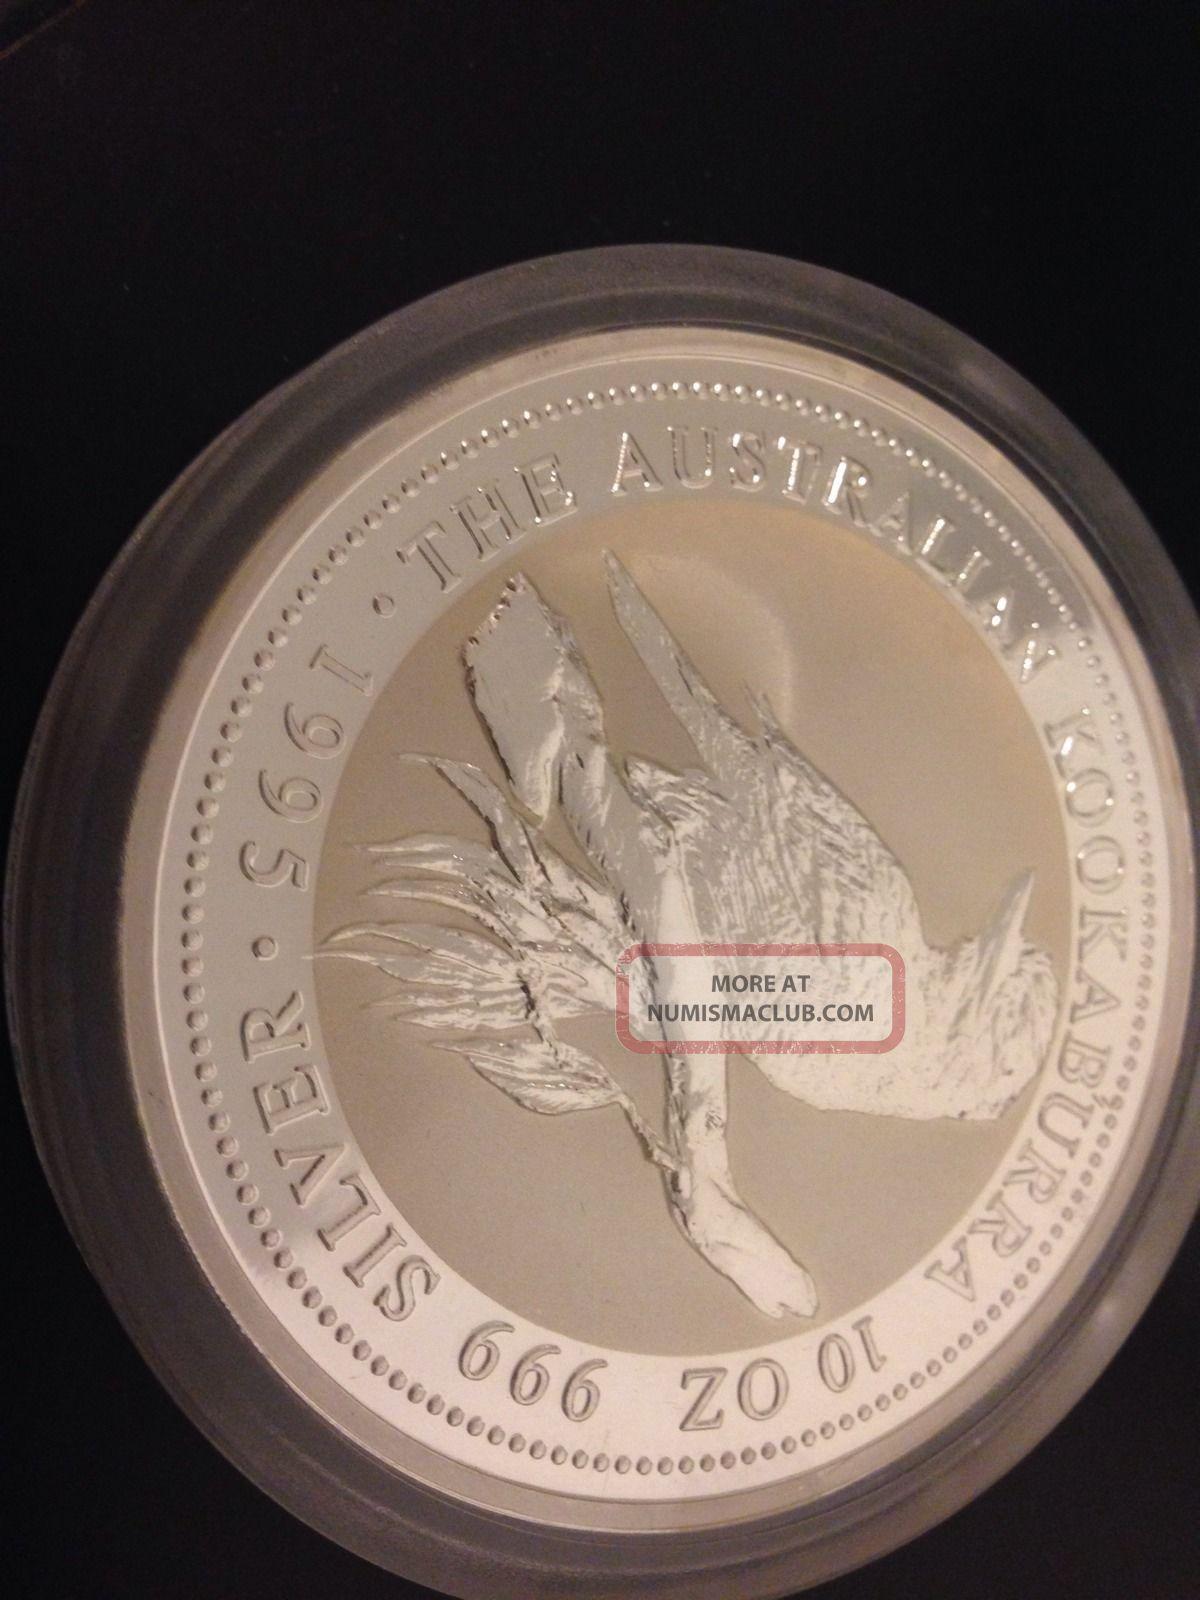 1995 10 Oz Silver Australian Kookaburra 10 999 Coin